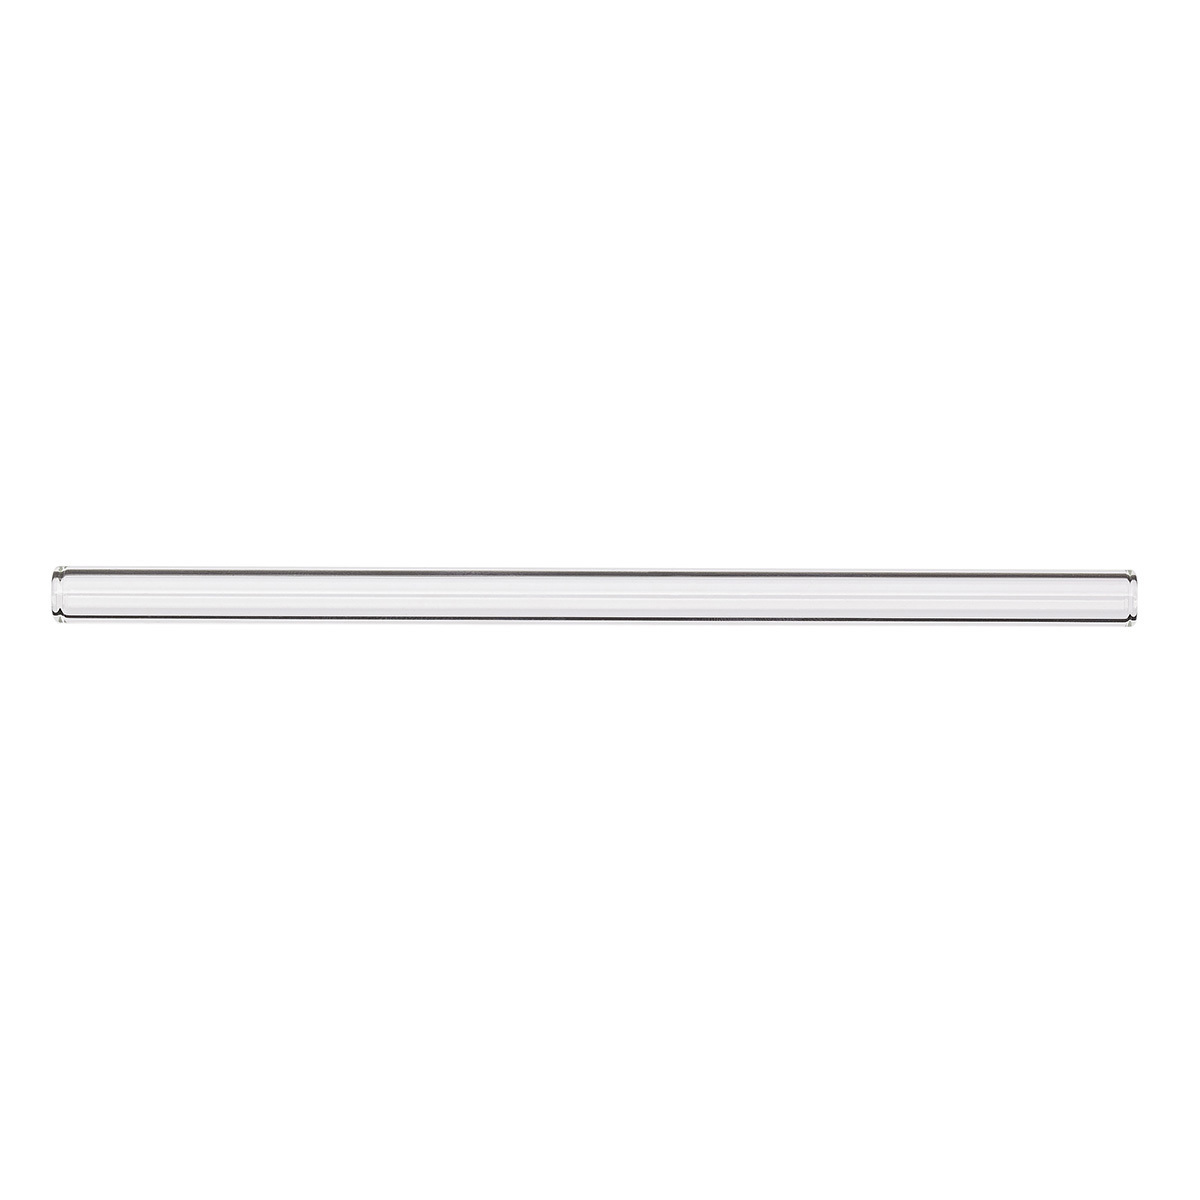 14-2017-10-trinkhalme-aus-glas-glaswerk-long-ansicht1-1200x1200px.jpg